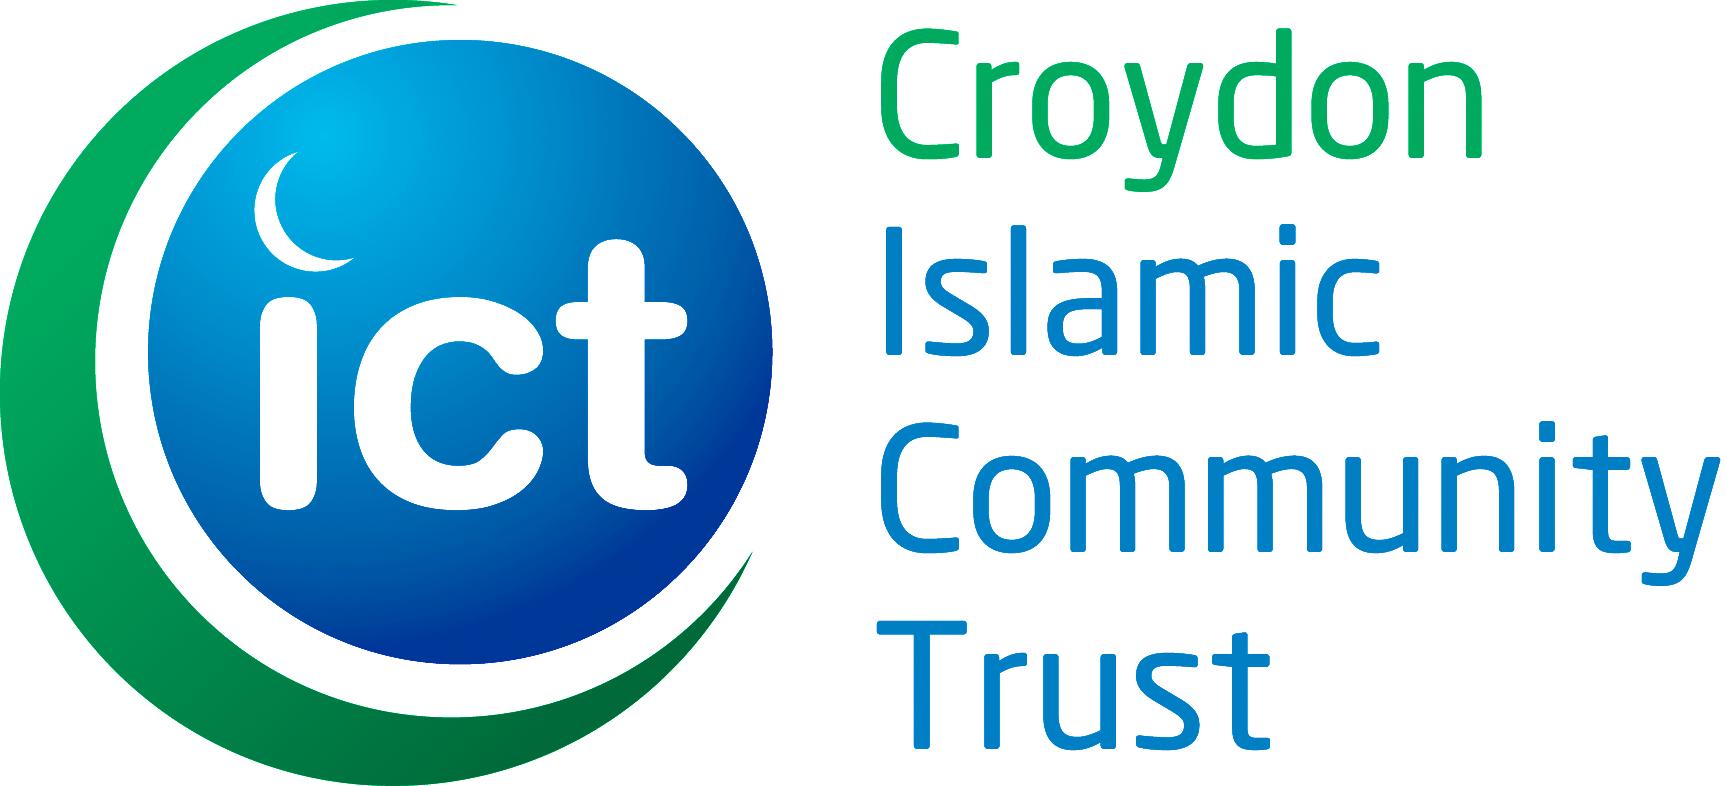 Croydon Islamic Community Trust